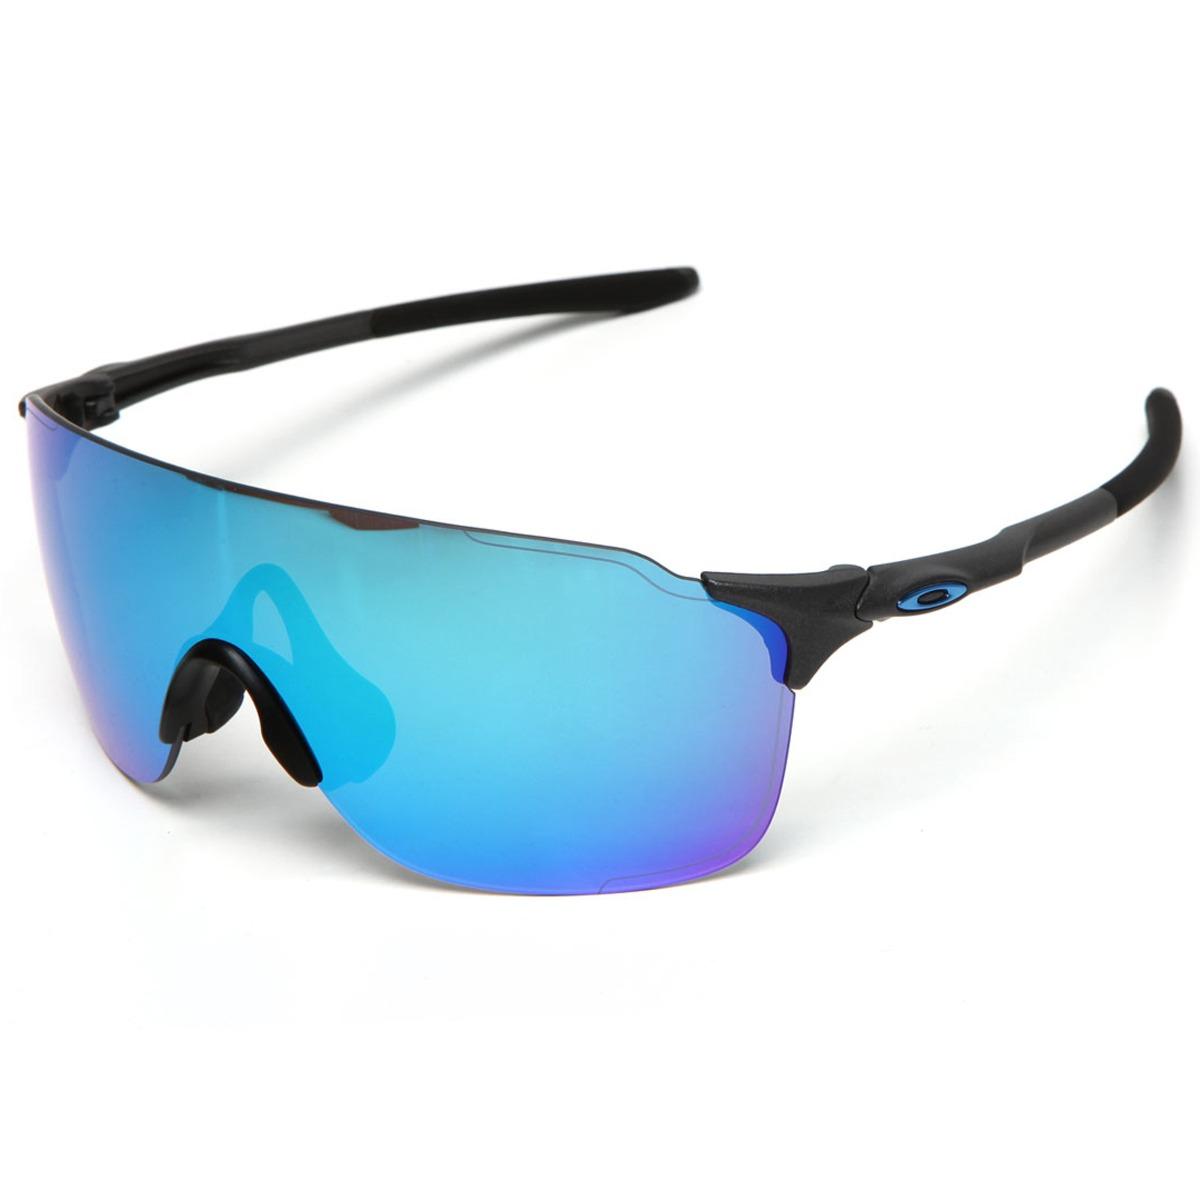 69c245b662f1b óculos oakley evzero stride steel  lente sapphire iridium. Carregando zoom.